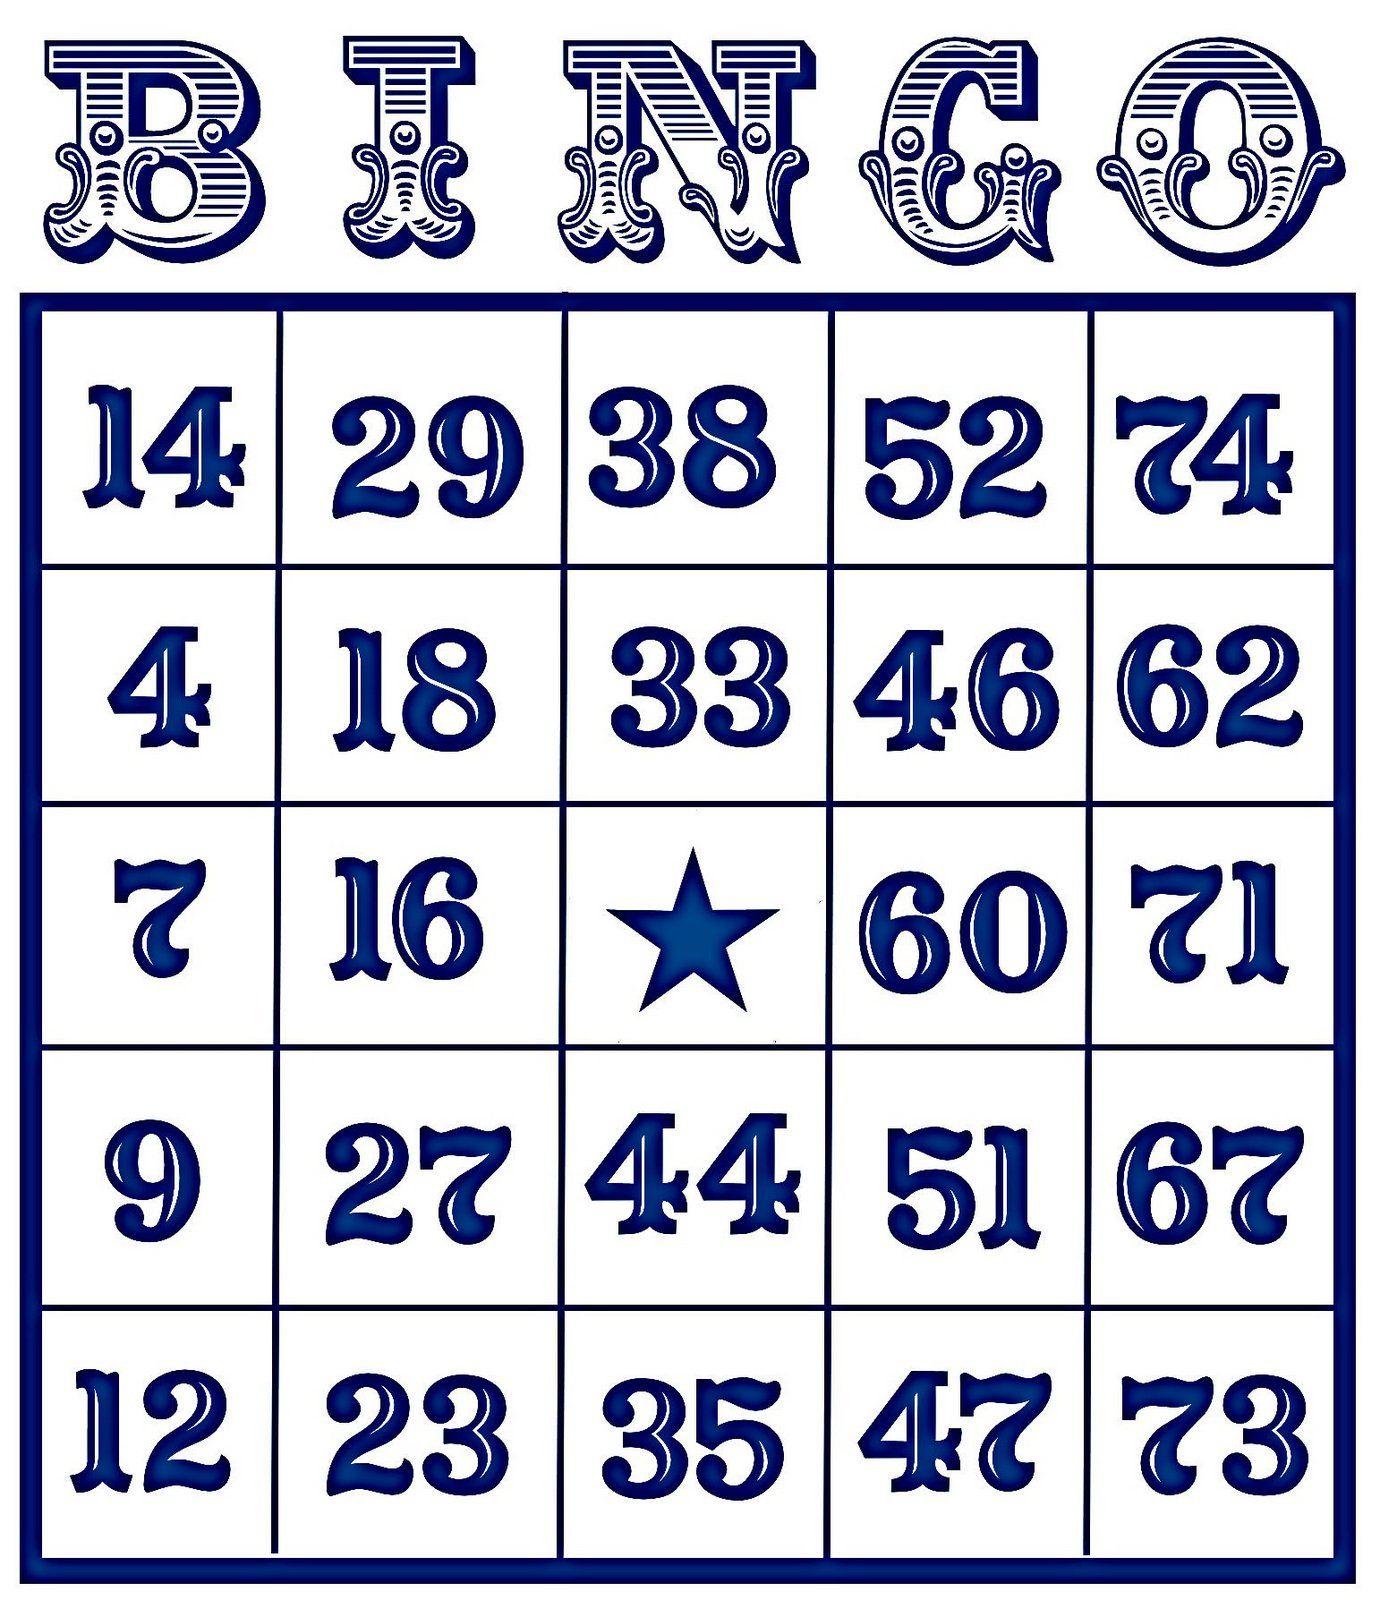 Bingo Card Vintage | Soldered Pendant Ideas | Free Bingo Cards, Free - Free Printable Bingo Cards With Numbers